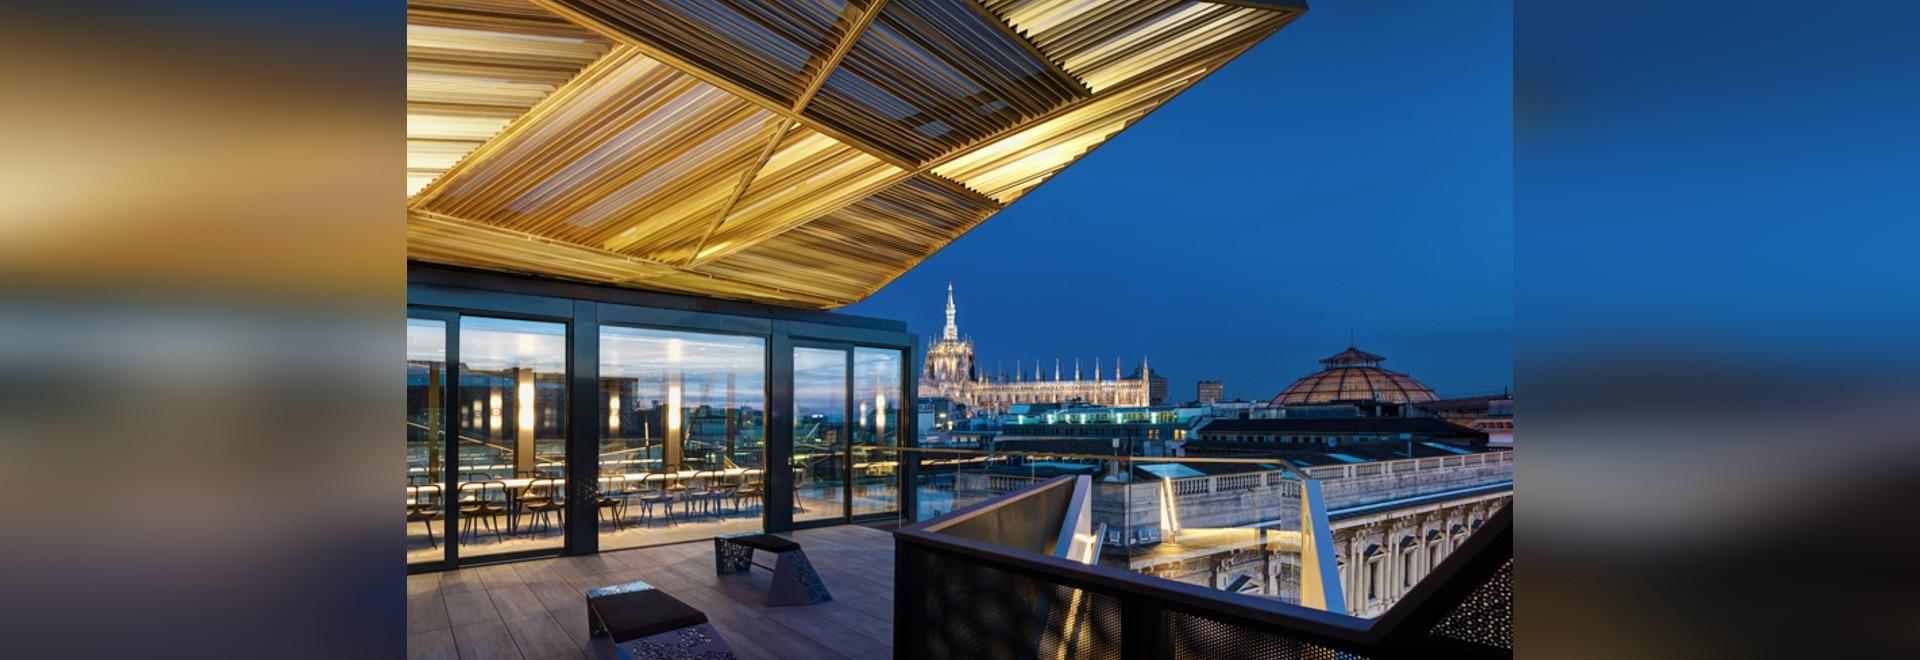 park associati installs modular pop-up restaurant on a milan rooftop